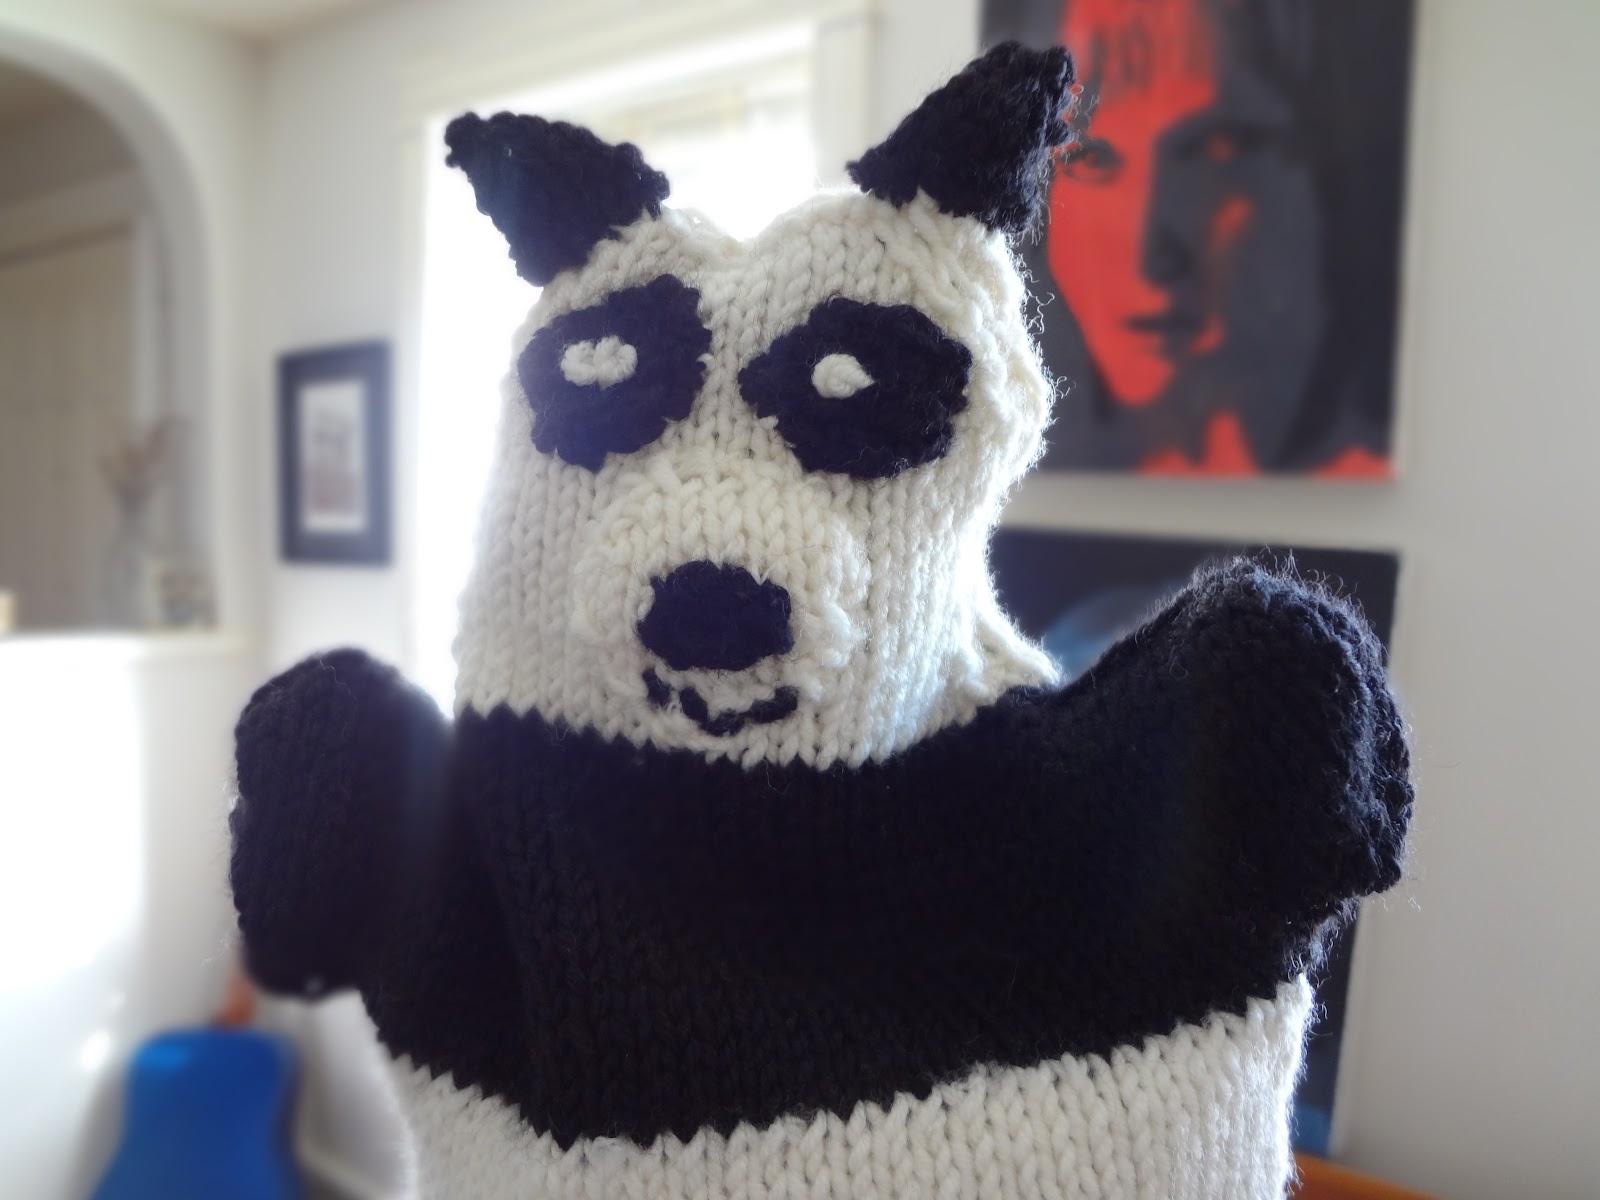 Domestic Bliss: Knitted Panda Bear Hand Puppet